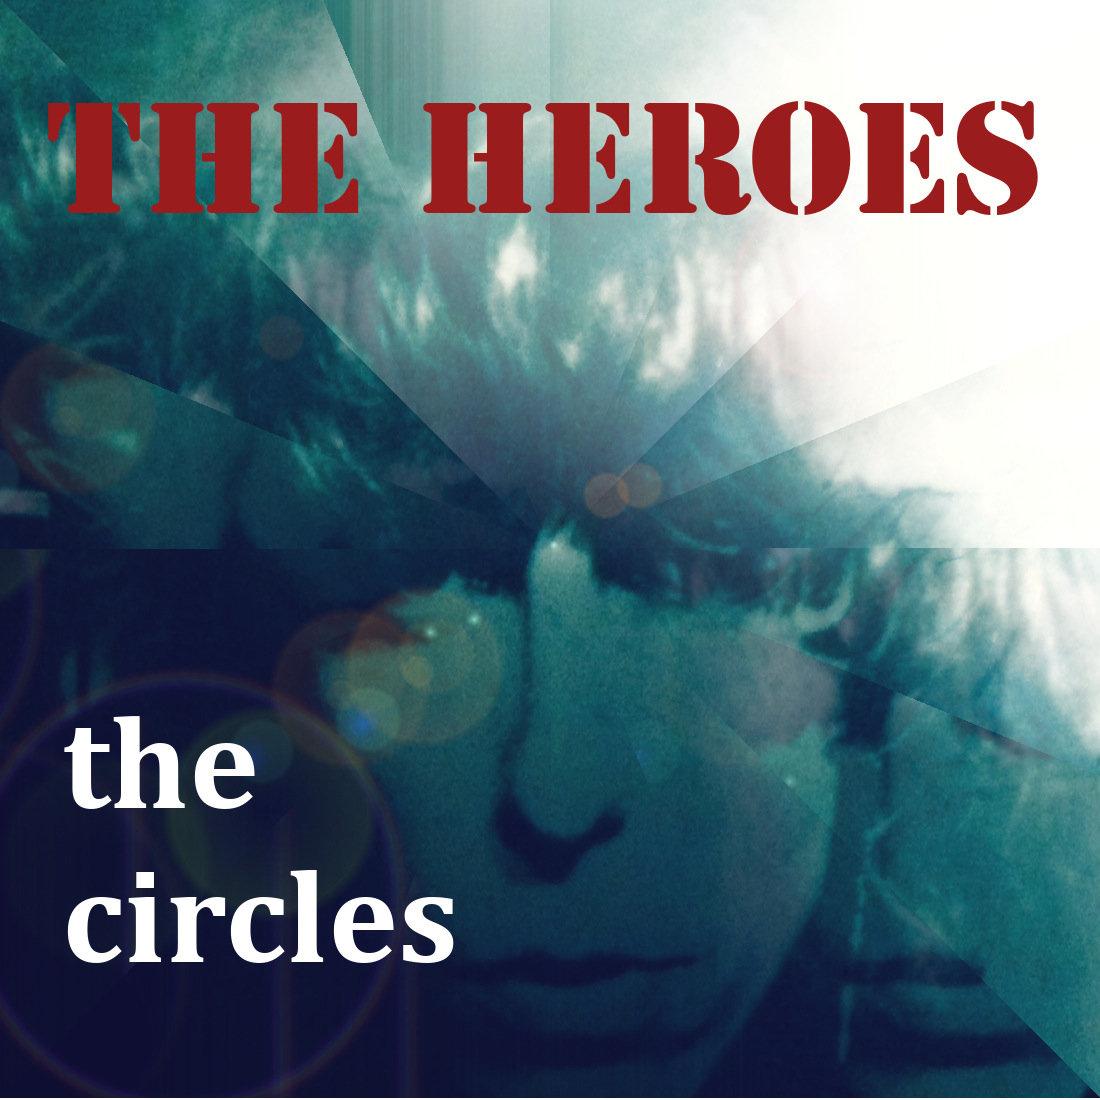 https://chrisbradford.bandcamp.com/track/the-circles-single